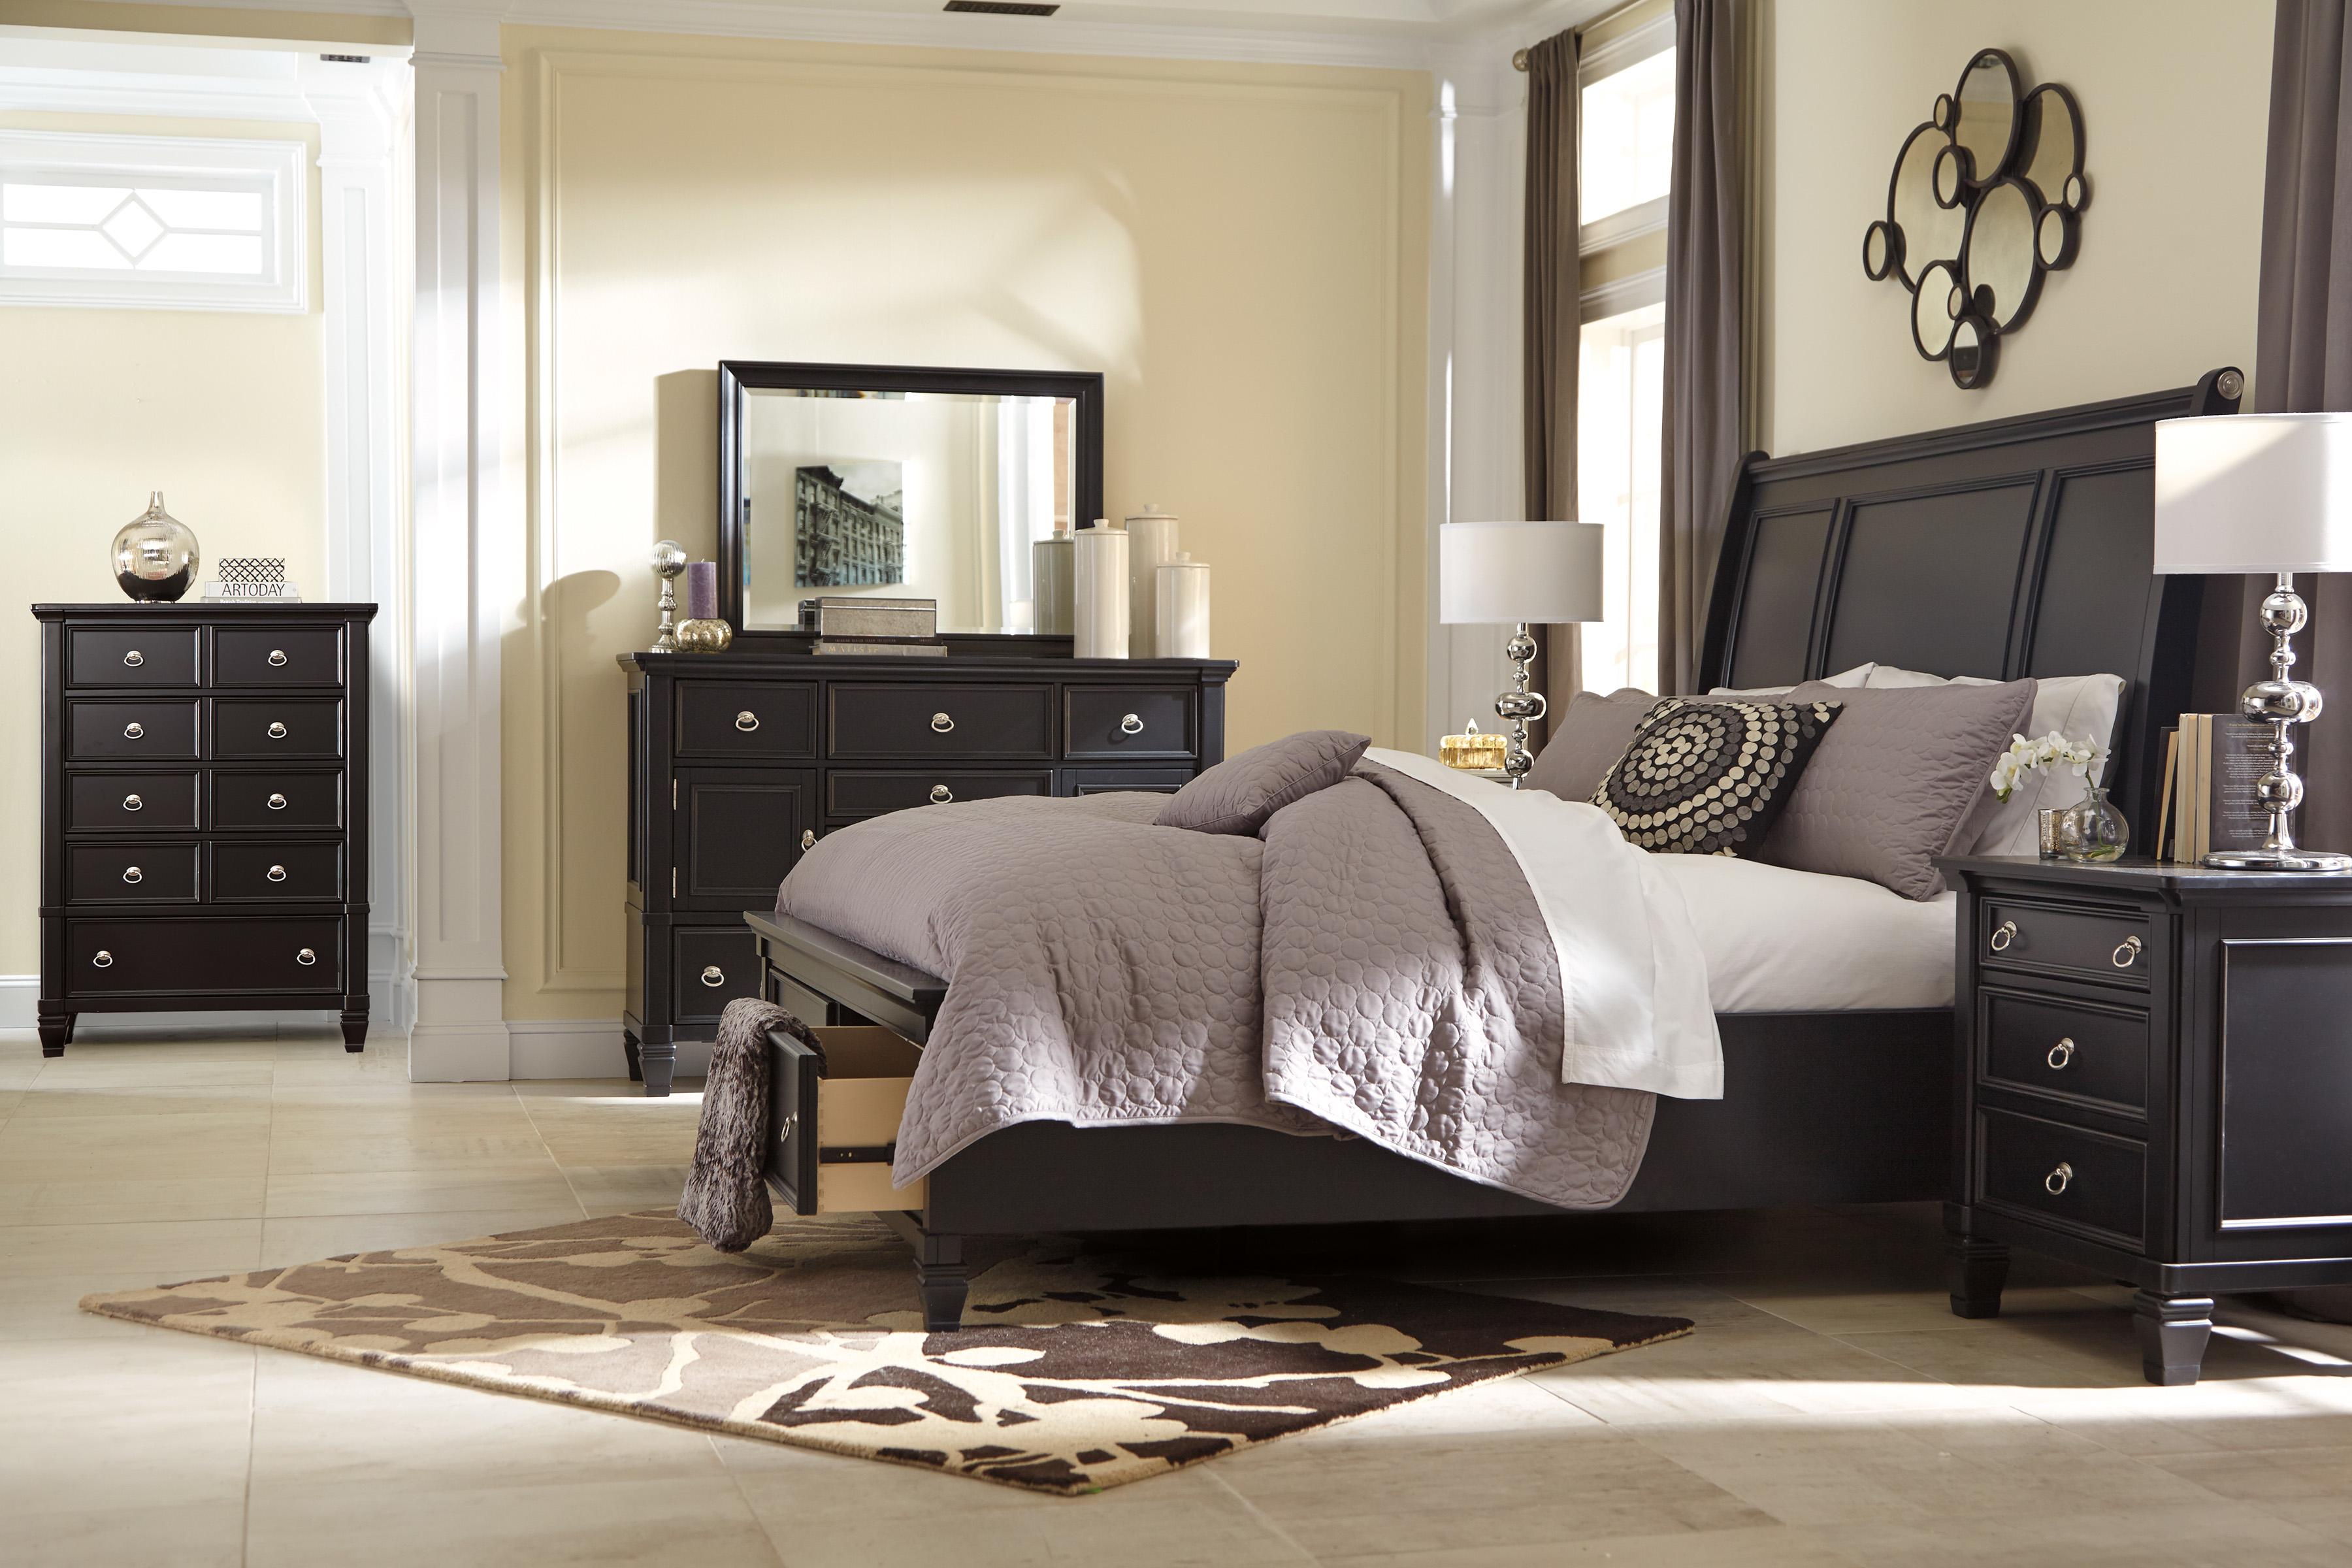 Ashley Furniture Homestore Fairfield Ca